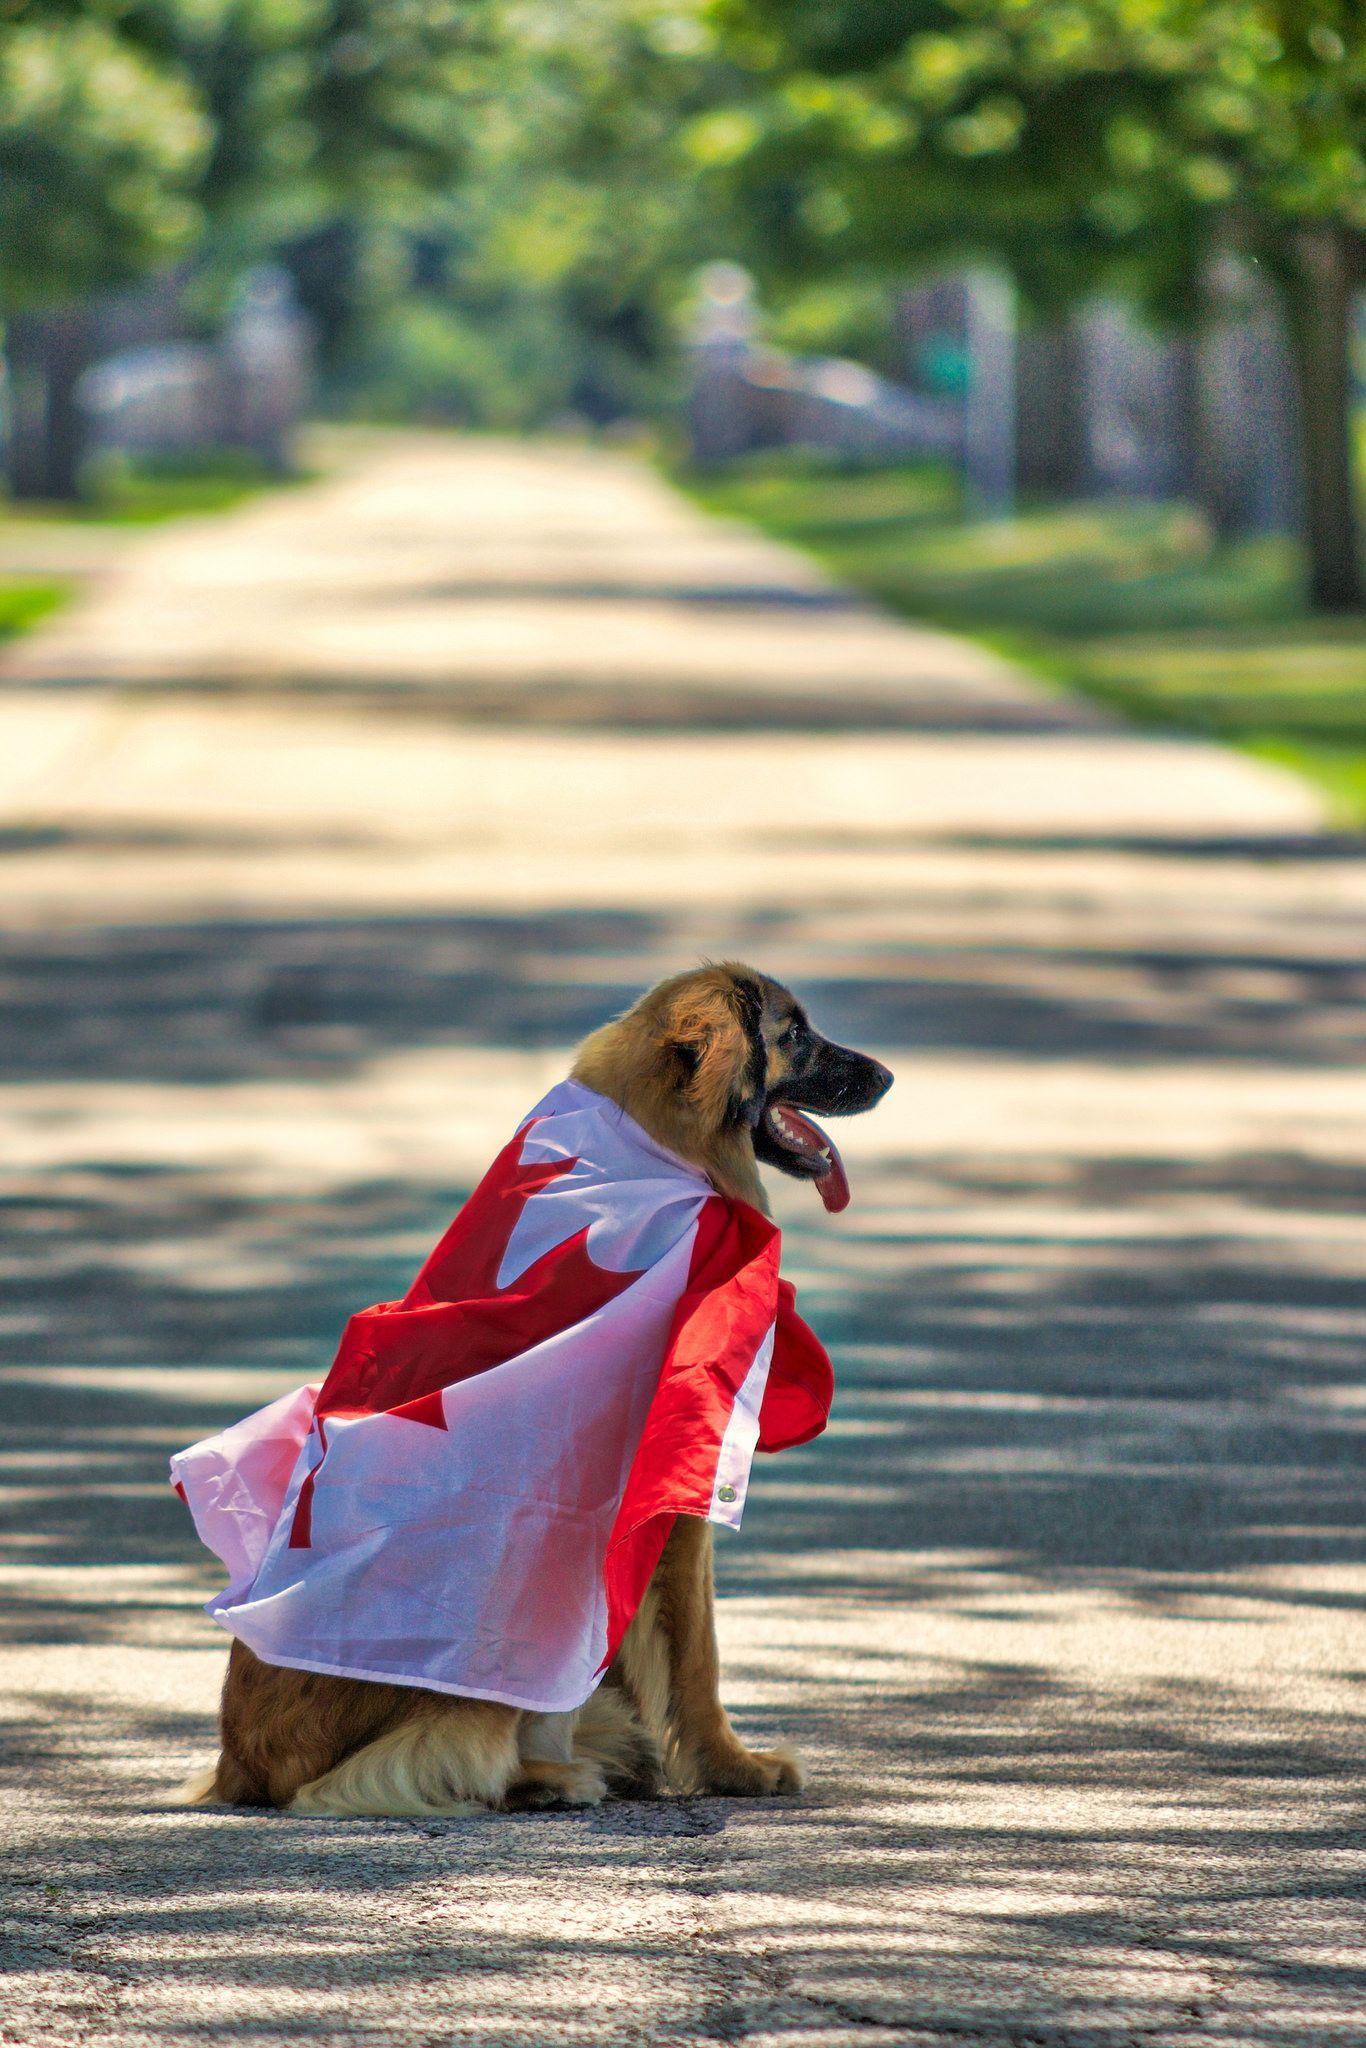 Happy Birthday Luna Leonberger Dogsofinstagram Dog Leonbergersofinstagram Gentlegiant Puppy Leonbergerstyle Dogs Leo Chatham Kent